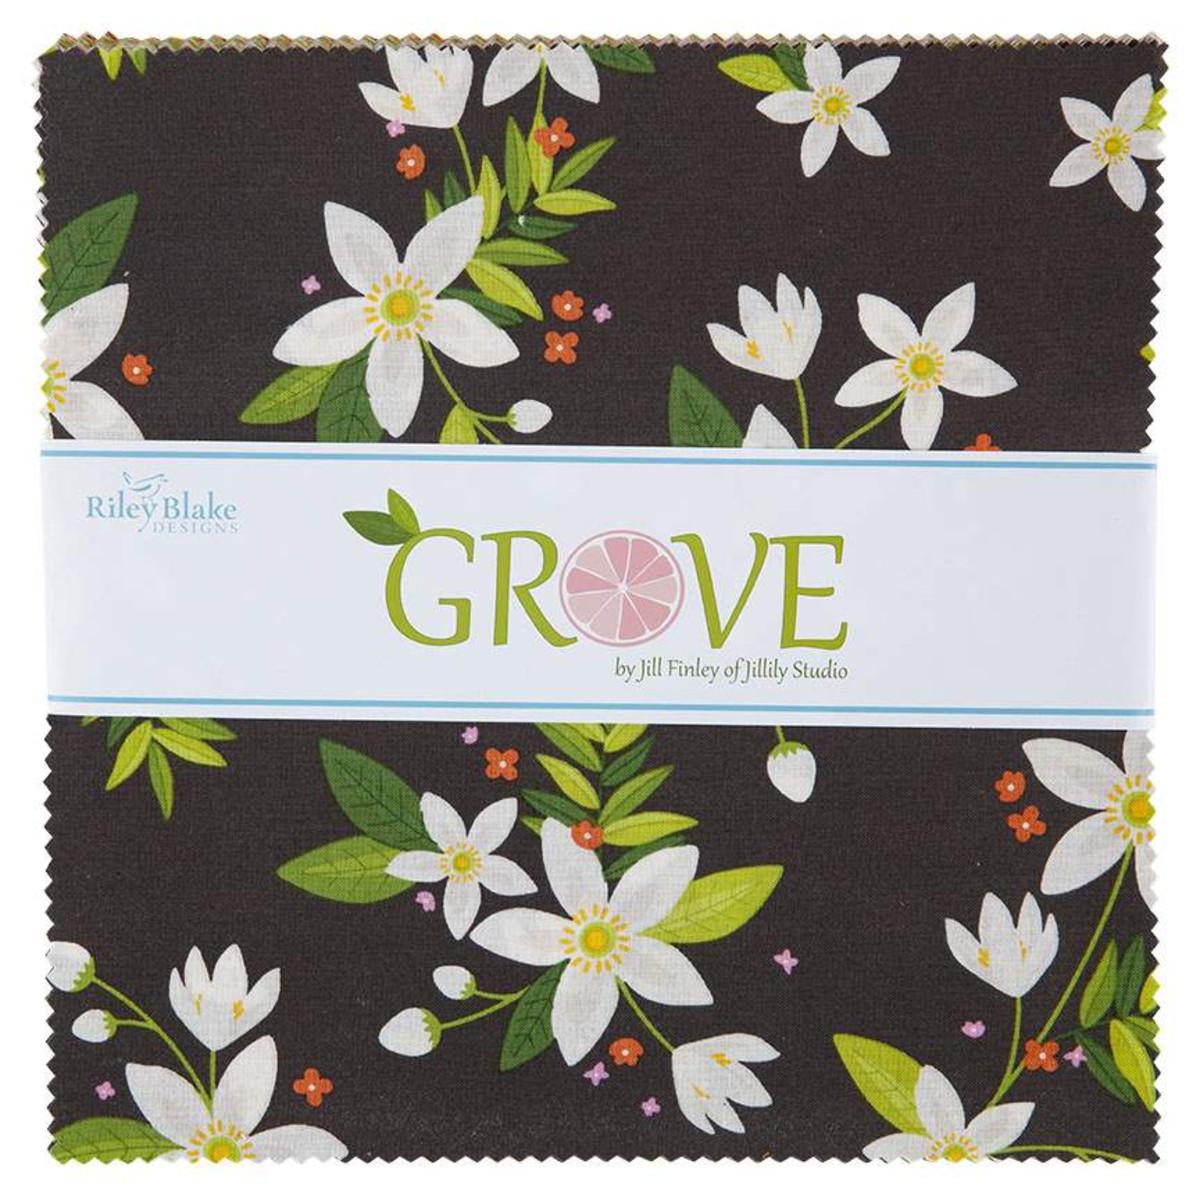 Riley Blake Layer Cake - Grove by Jill Finley